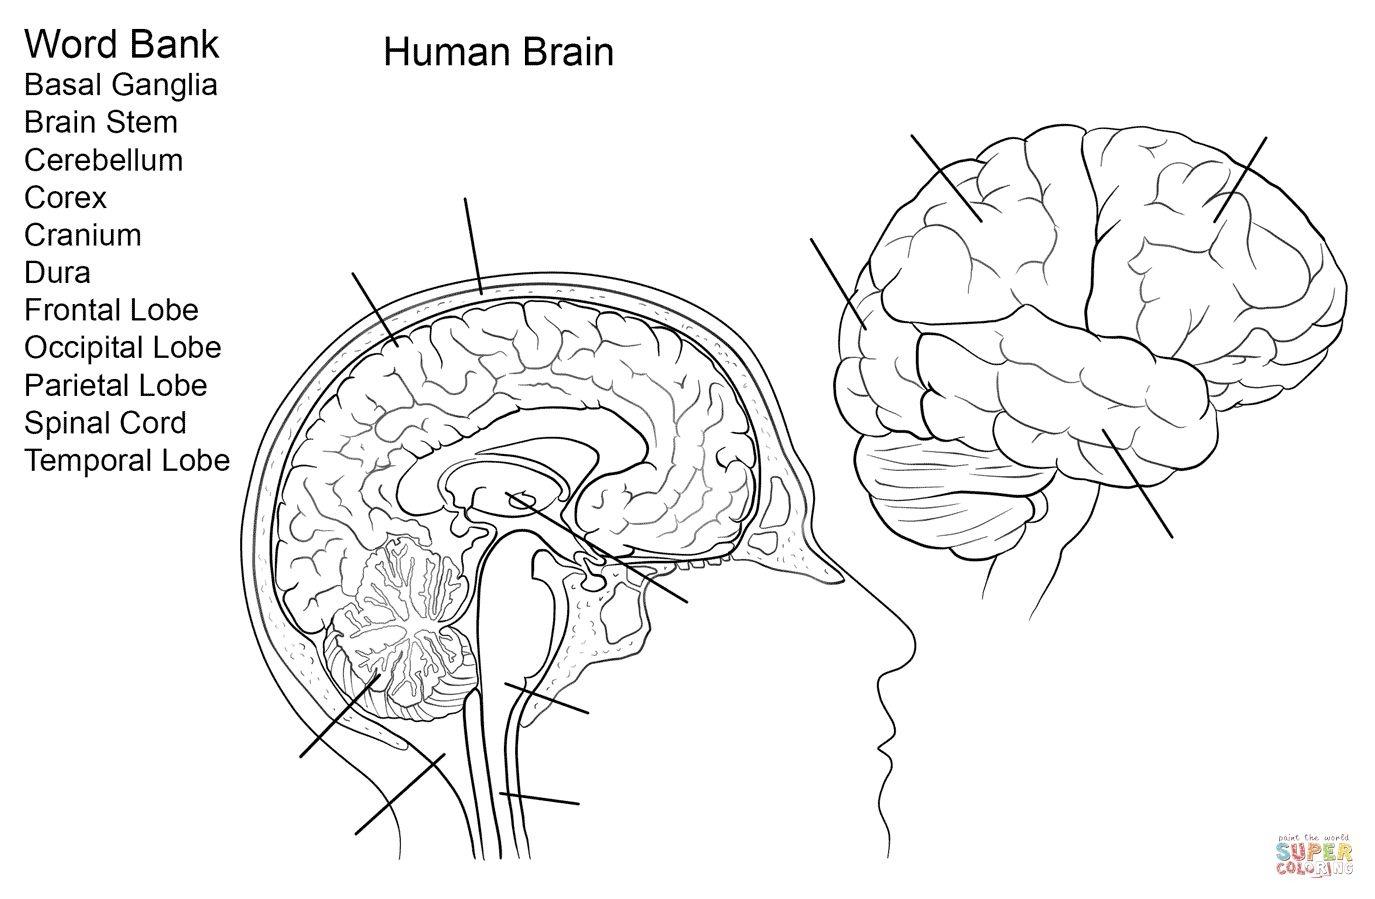 Brain Anatomy Worksheet Human Brain Worksheet Coloring Page Free - Free Anatomy Coloring Pages Printable